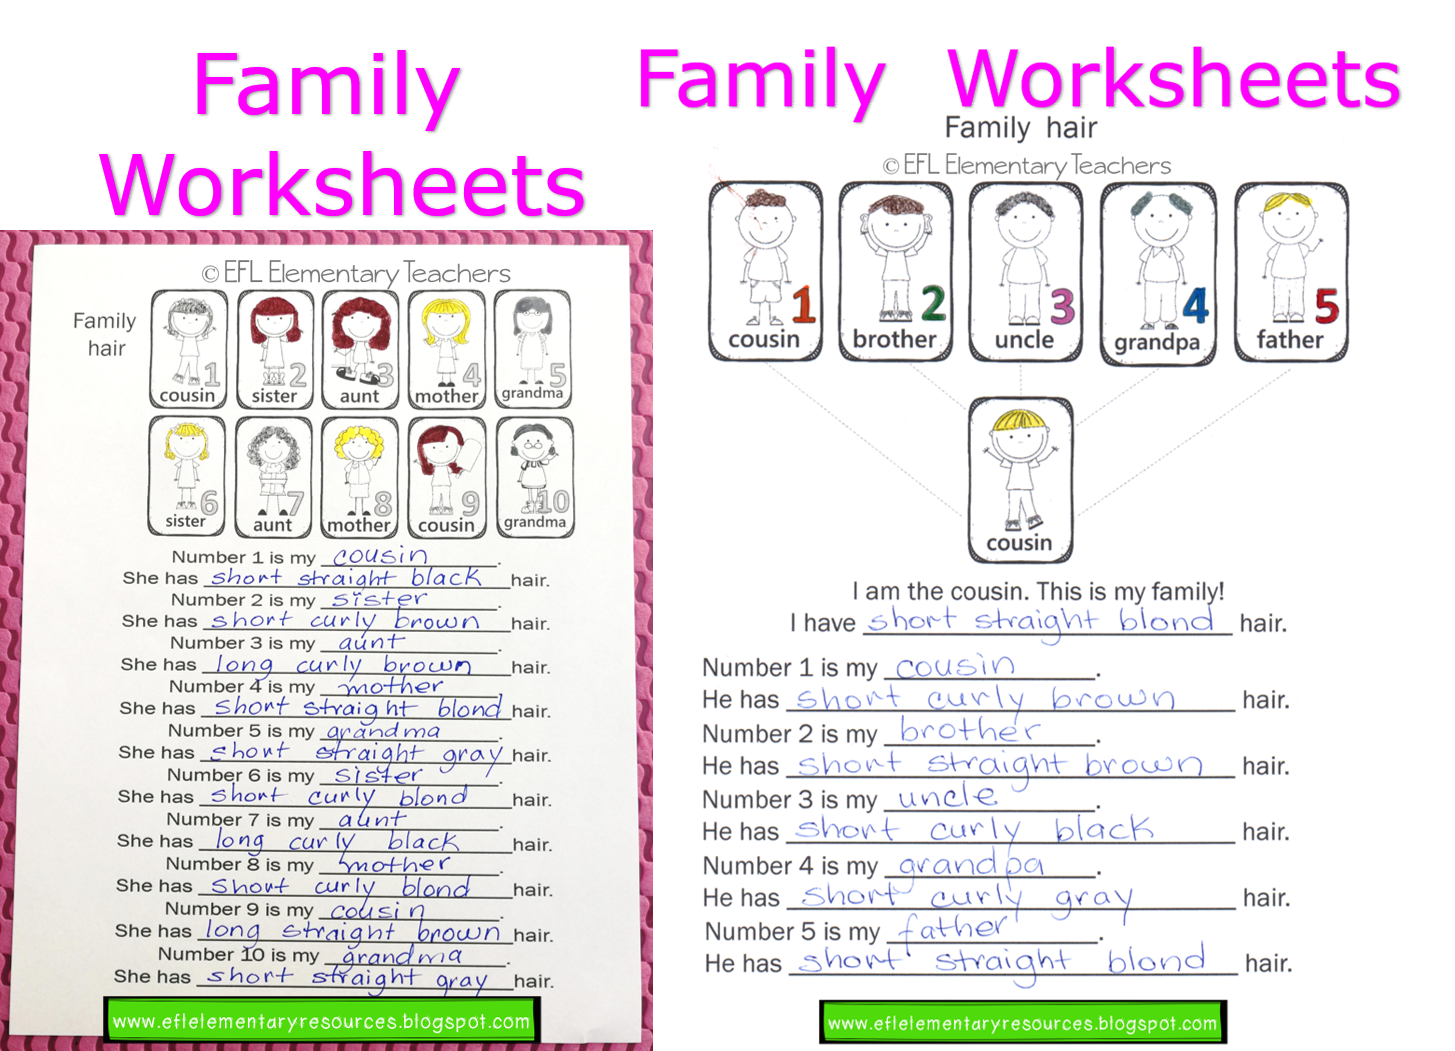 Efl Elementary Teachers Family Adjectives And Body Parts